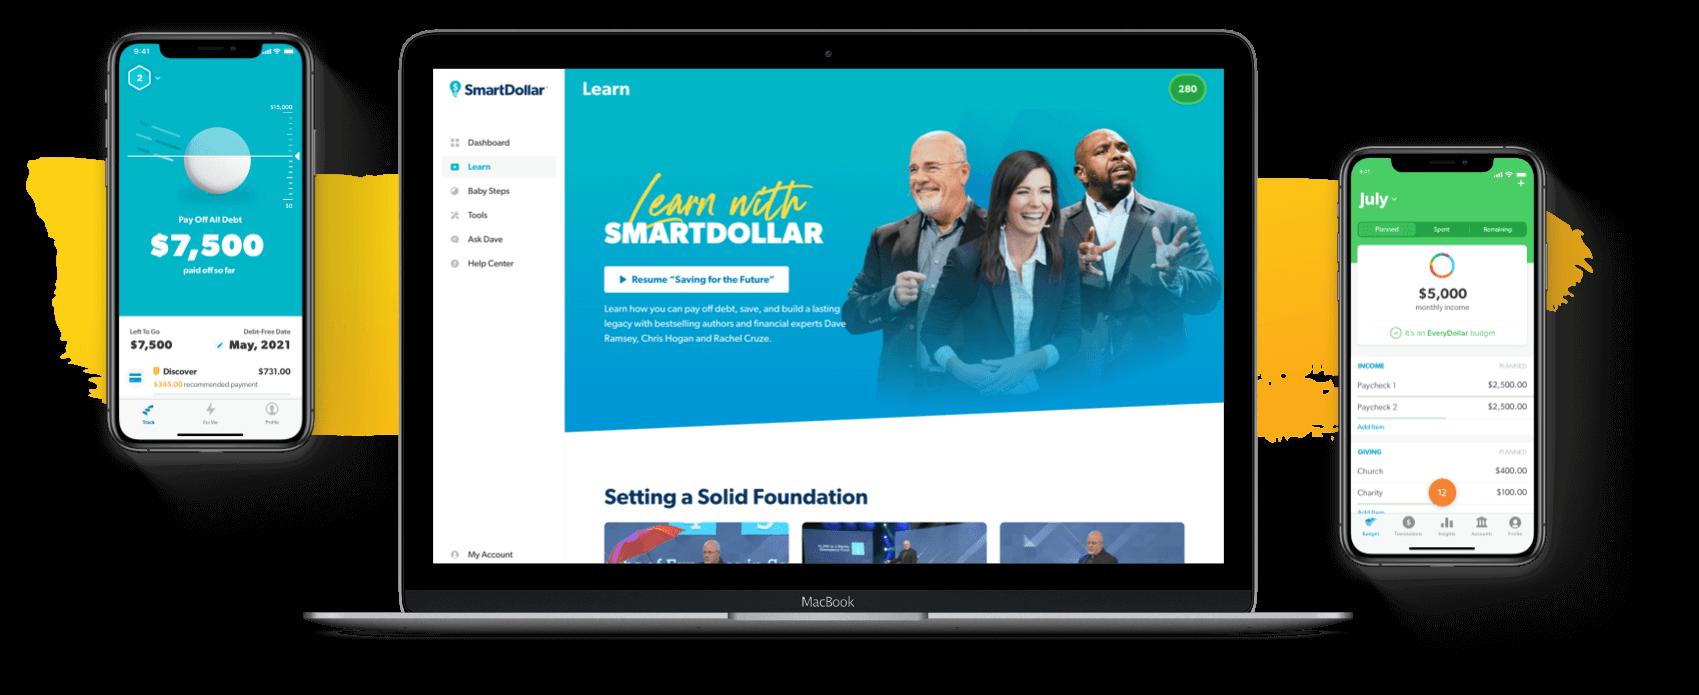 SmartDollar program viewed on lap top and mobile screens.